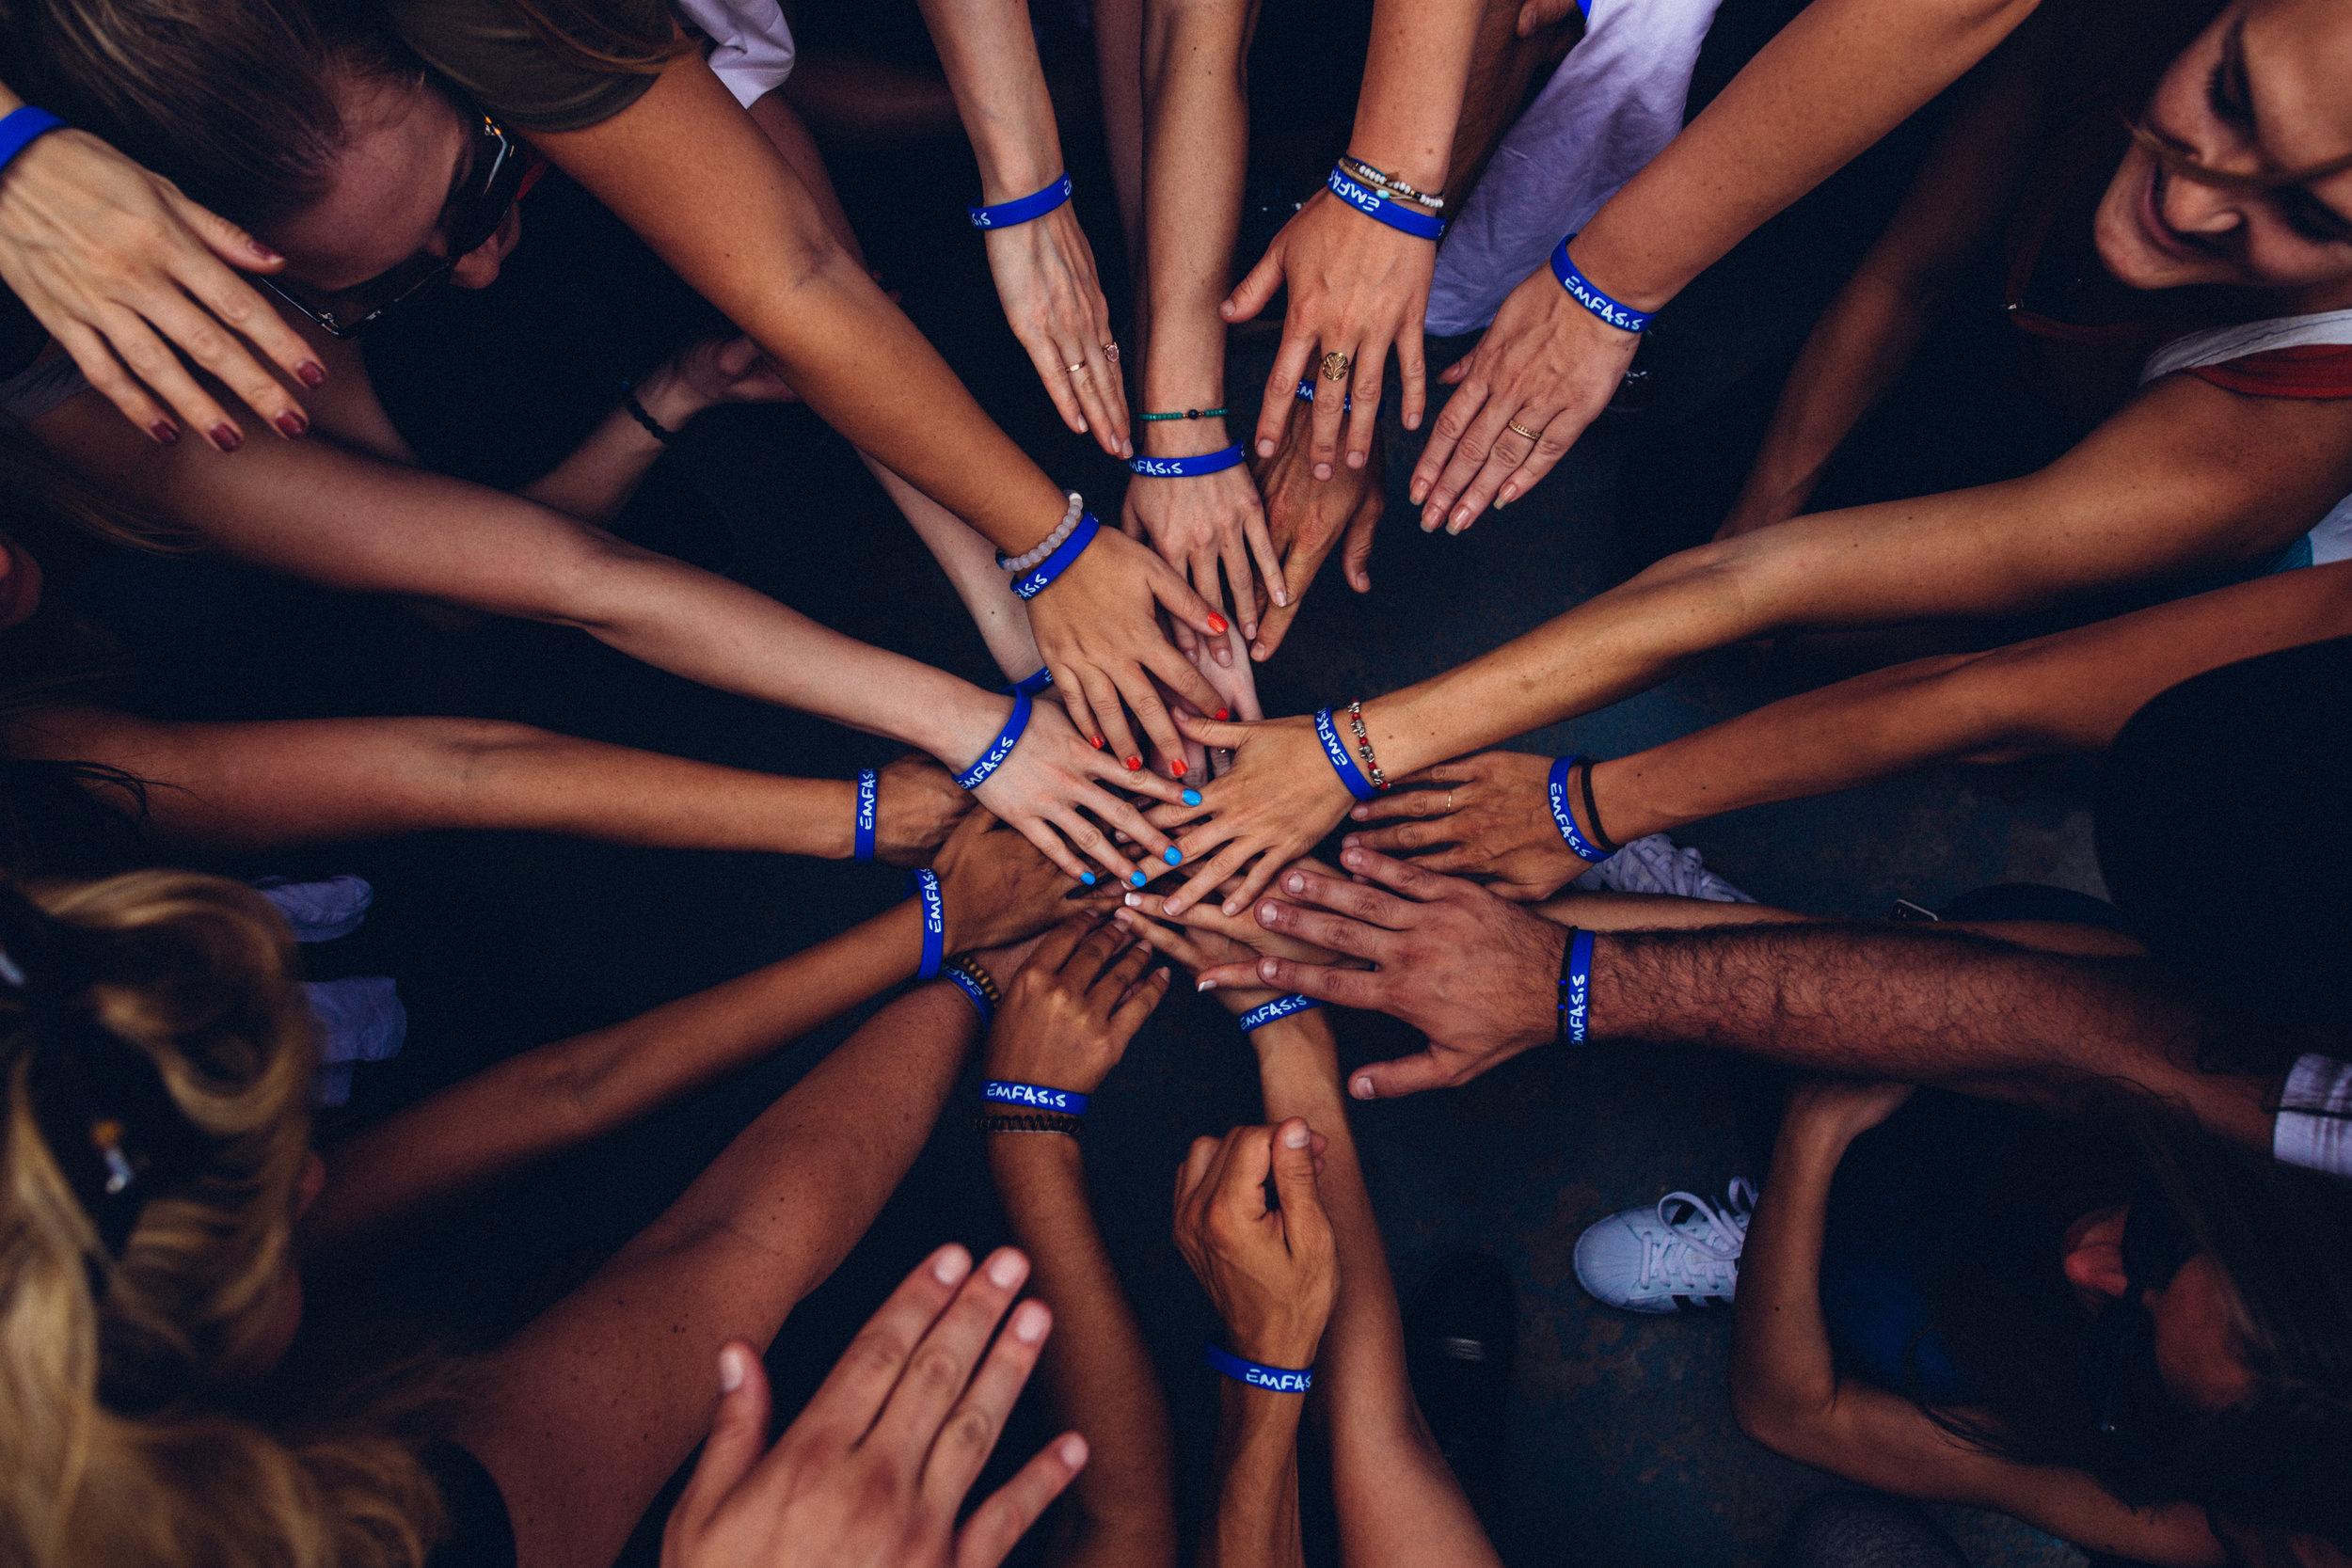 Corporate Retreats - teambuilding, meeting space, wellness, etc